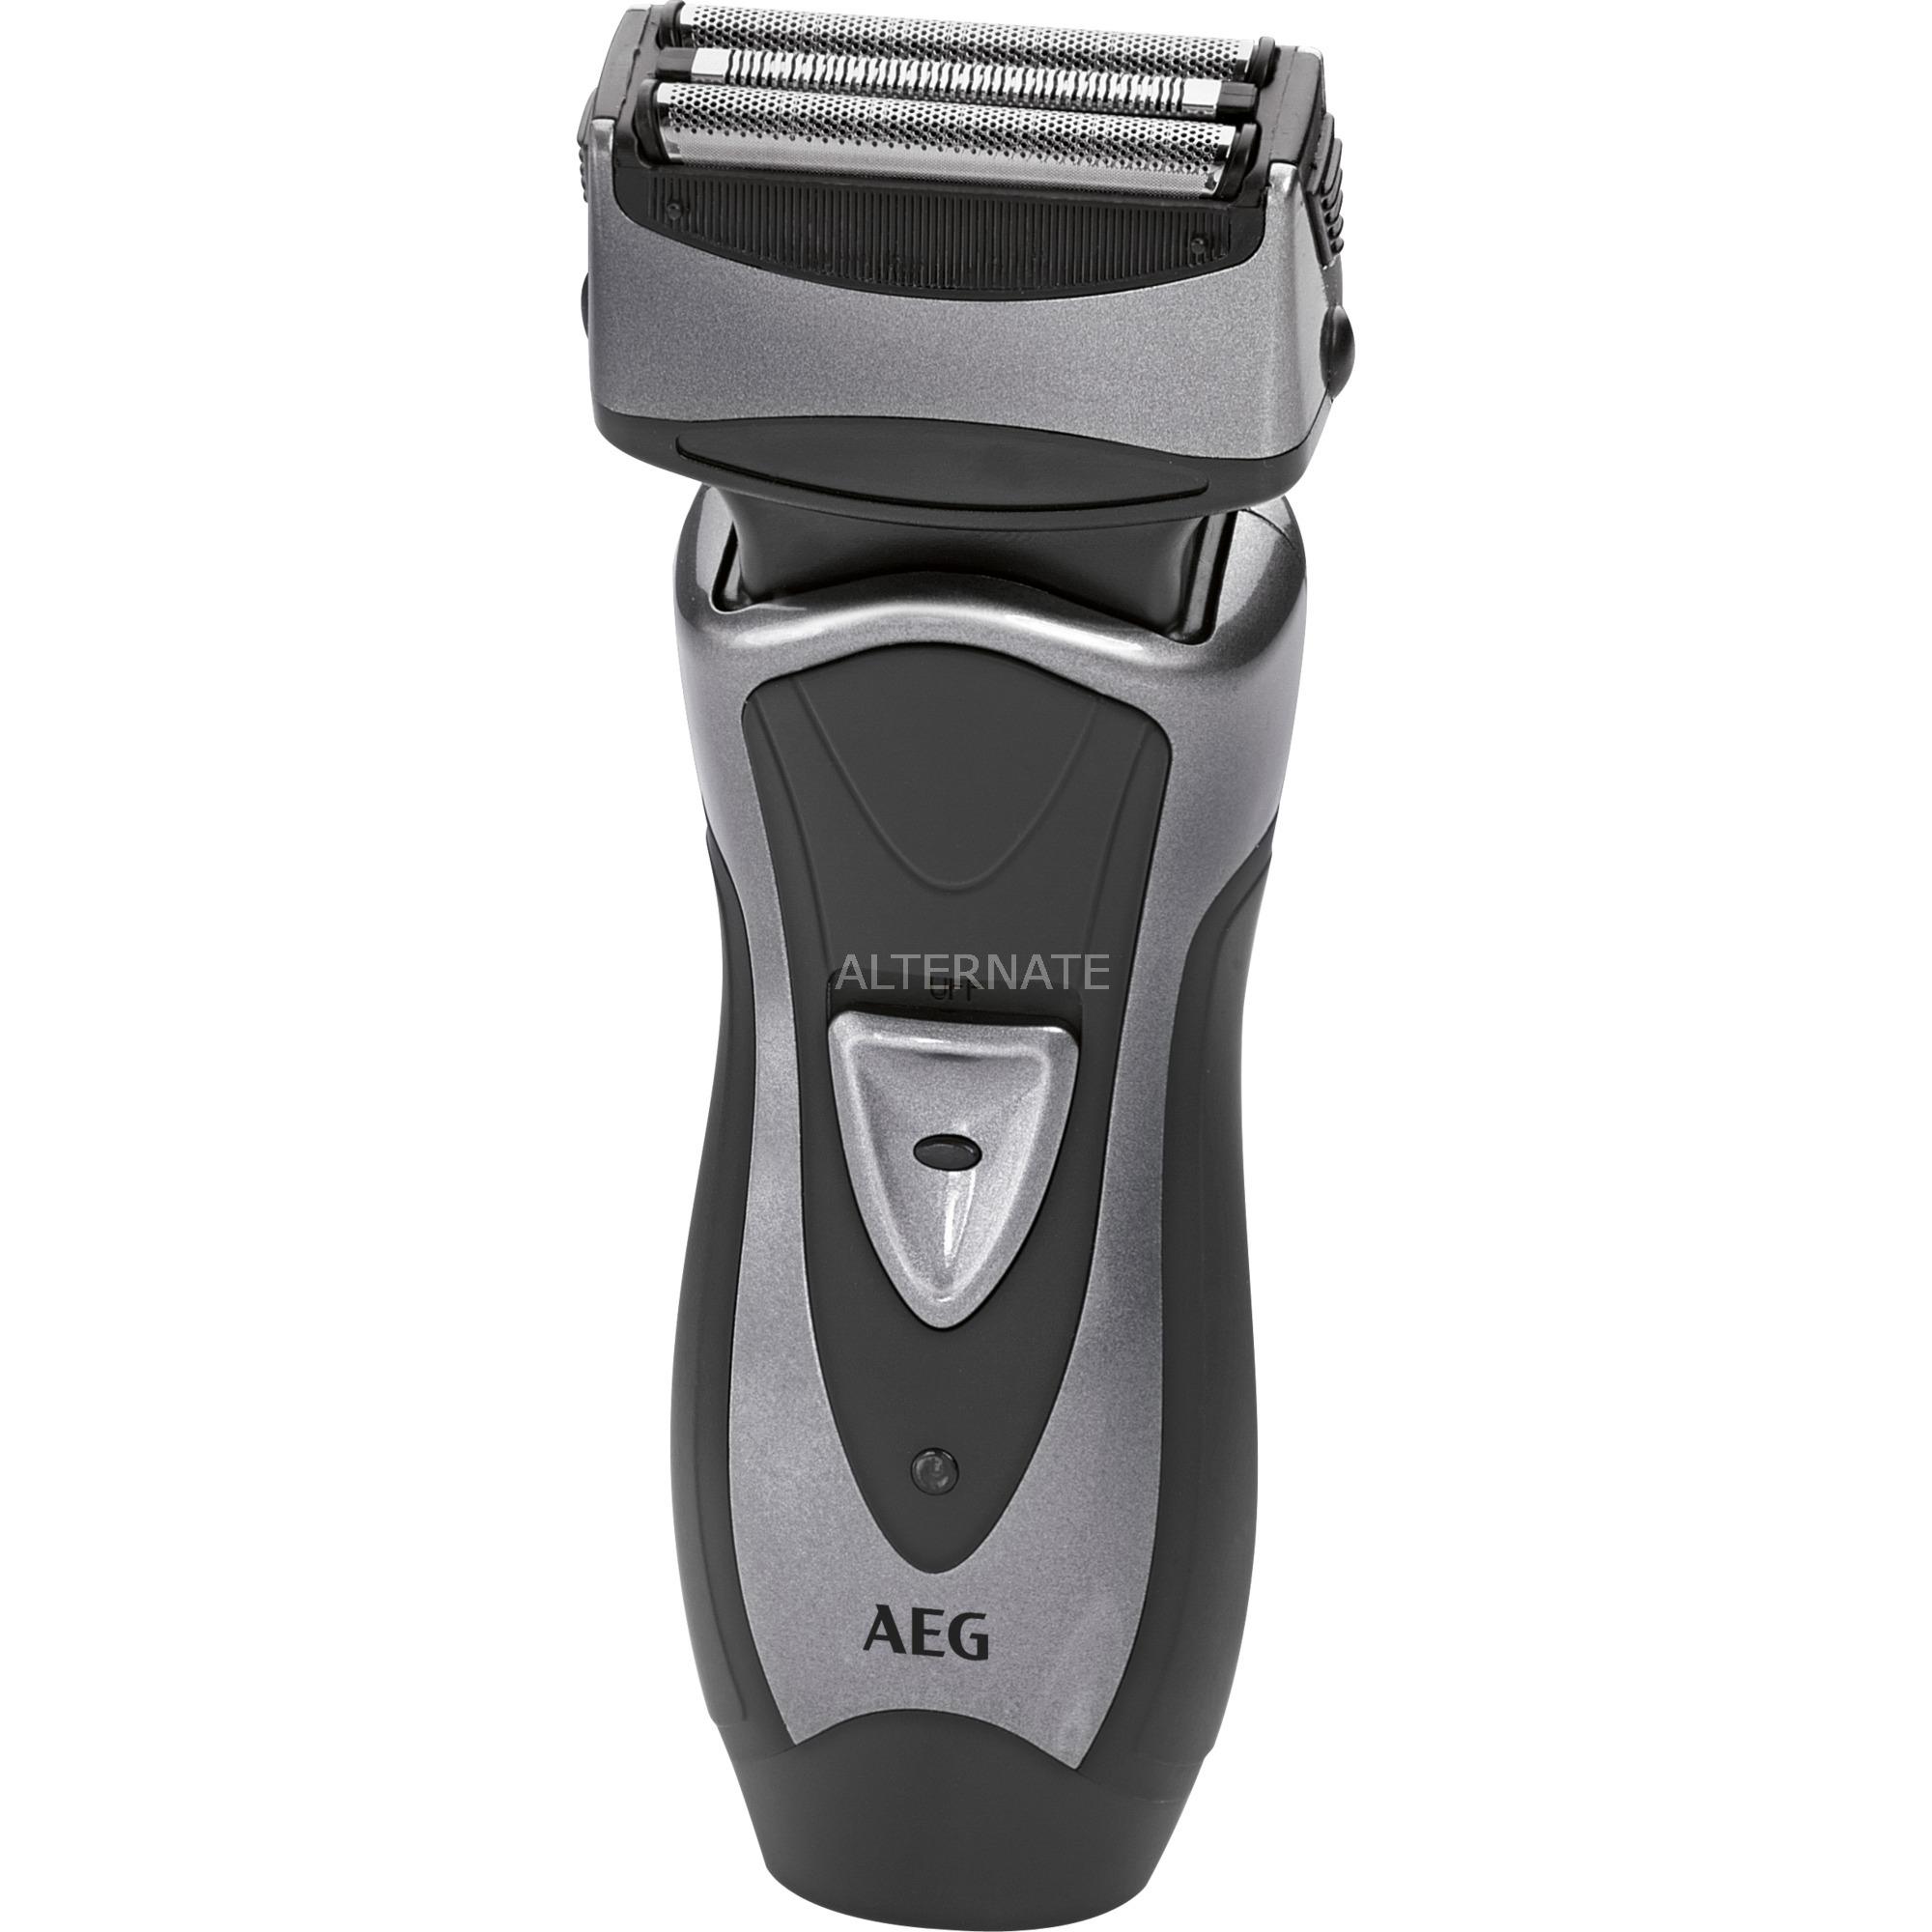 HR 5626 afeitadora Antracita, Máquina de afeitar